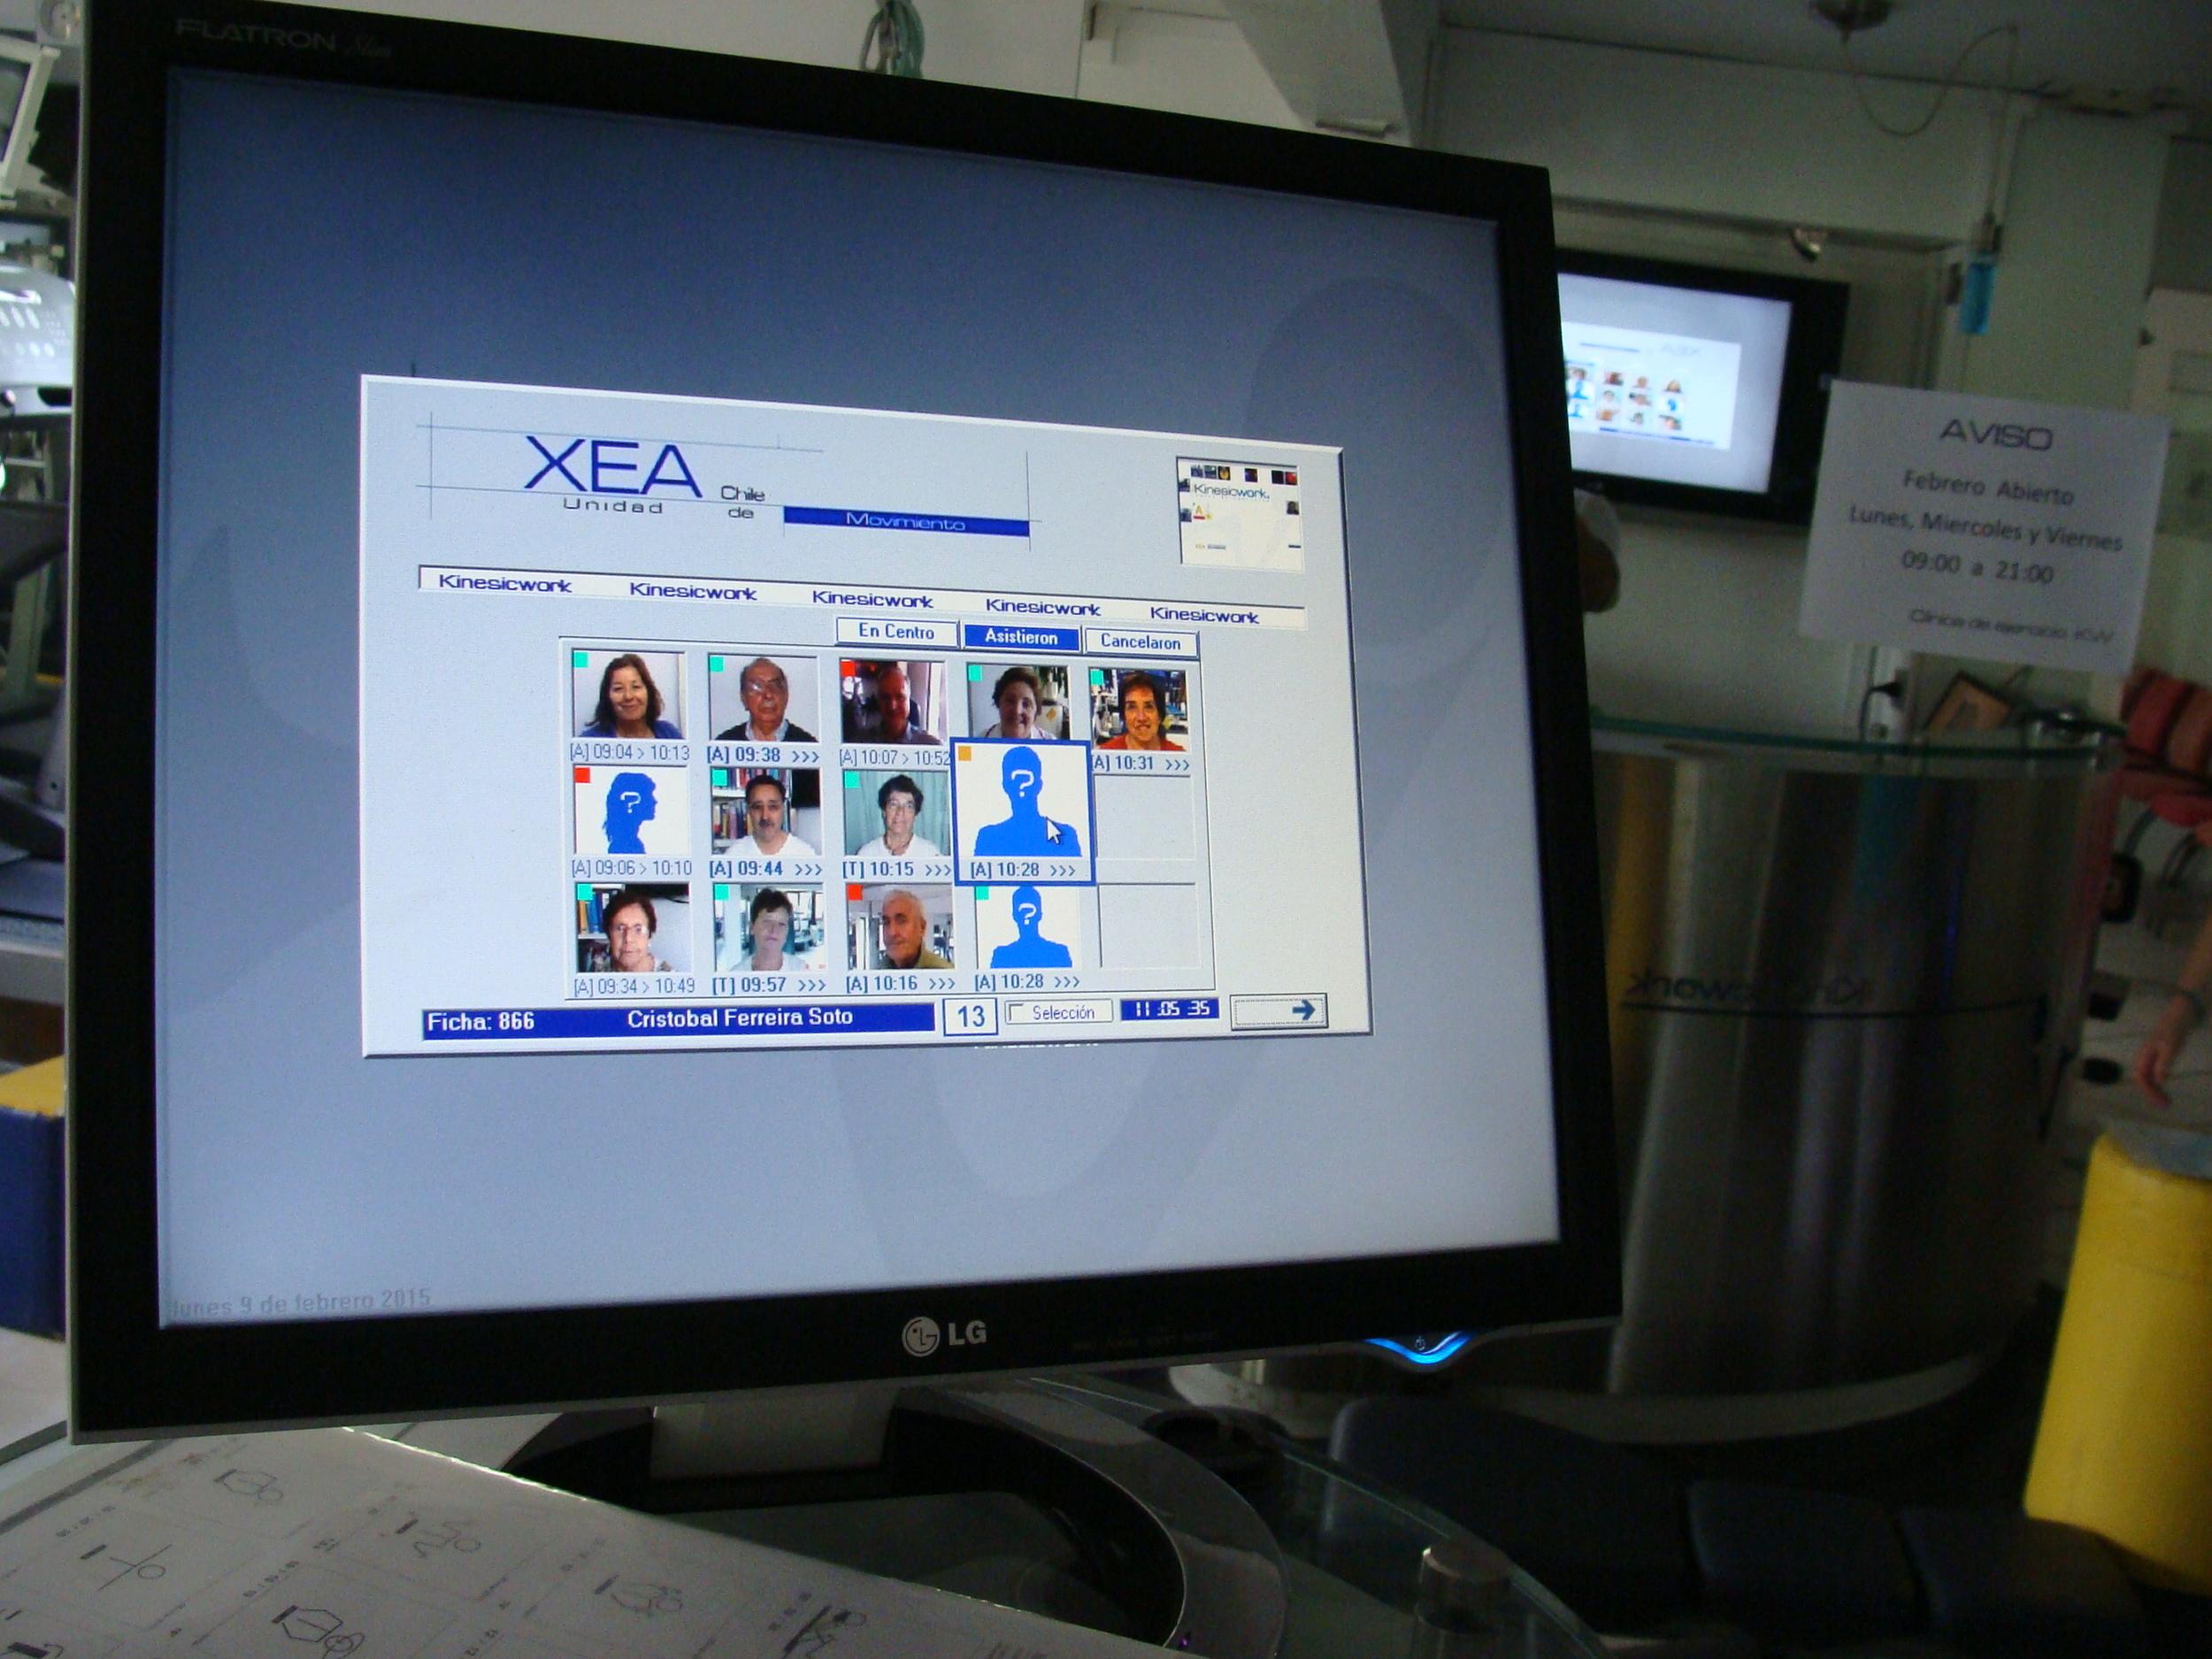 kinesiologia -  metodo xea  - pacientes - la reina.JPG